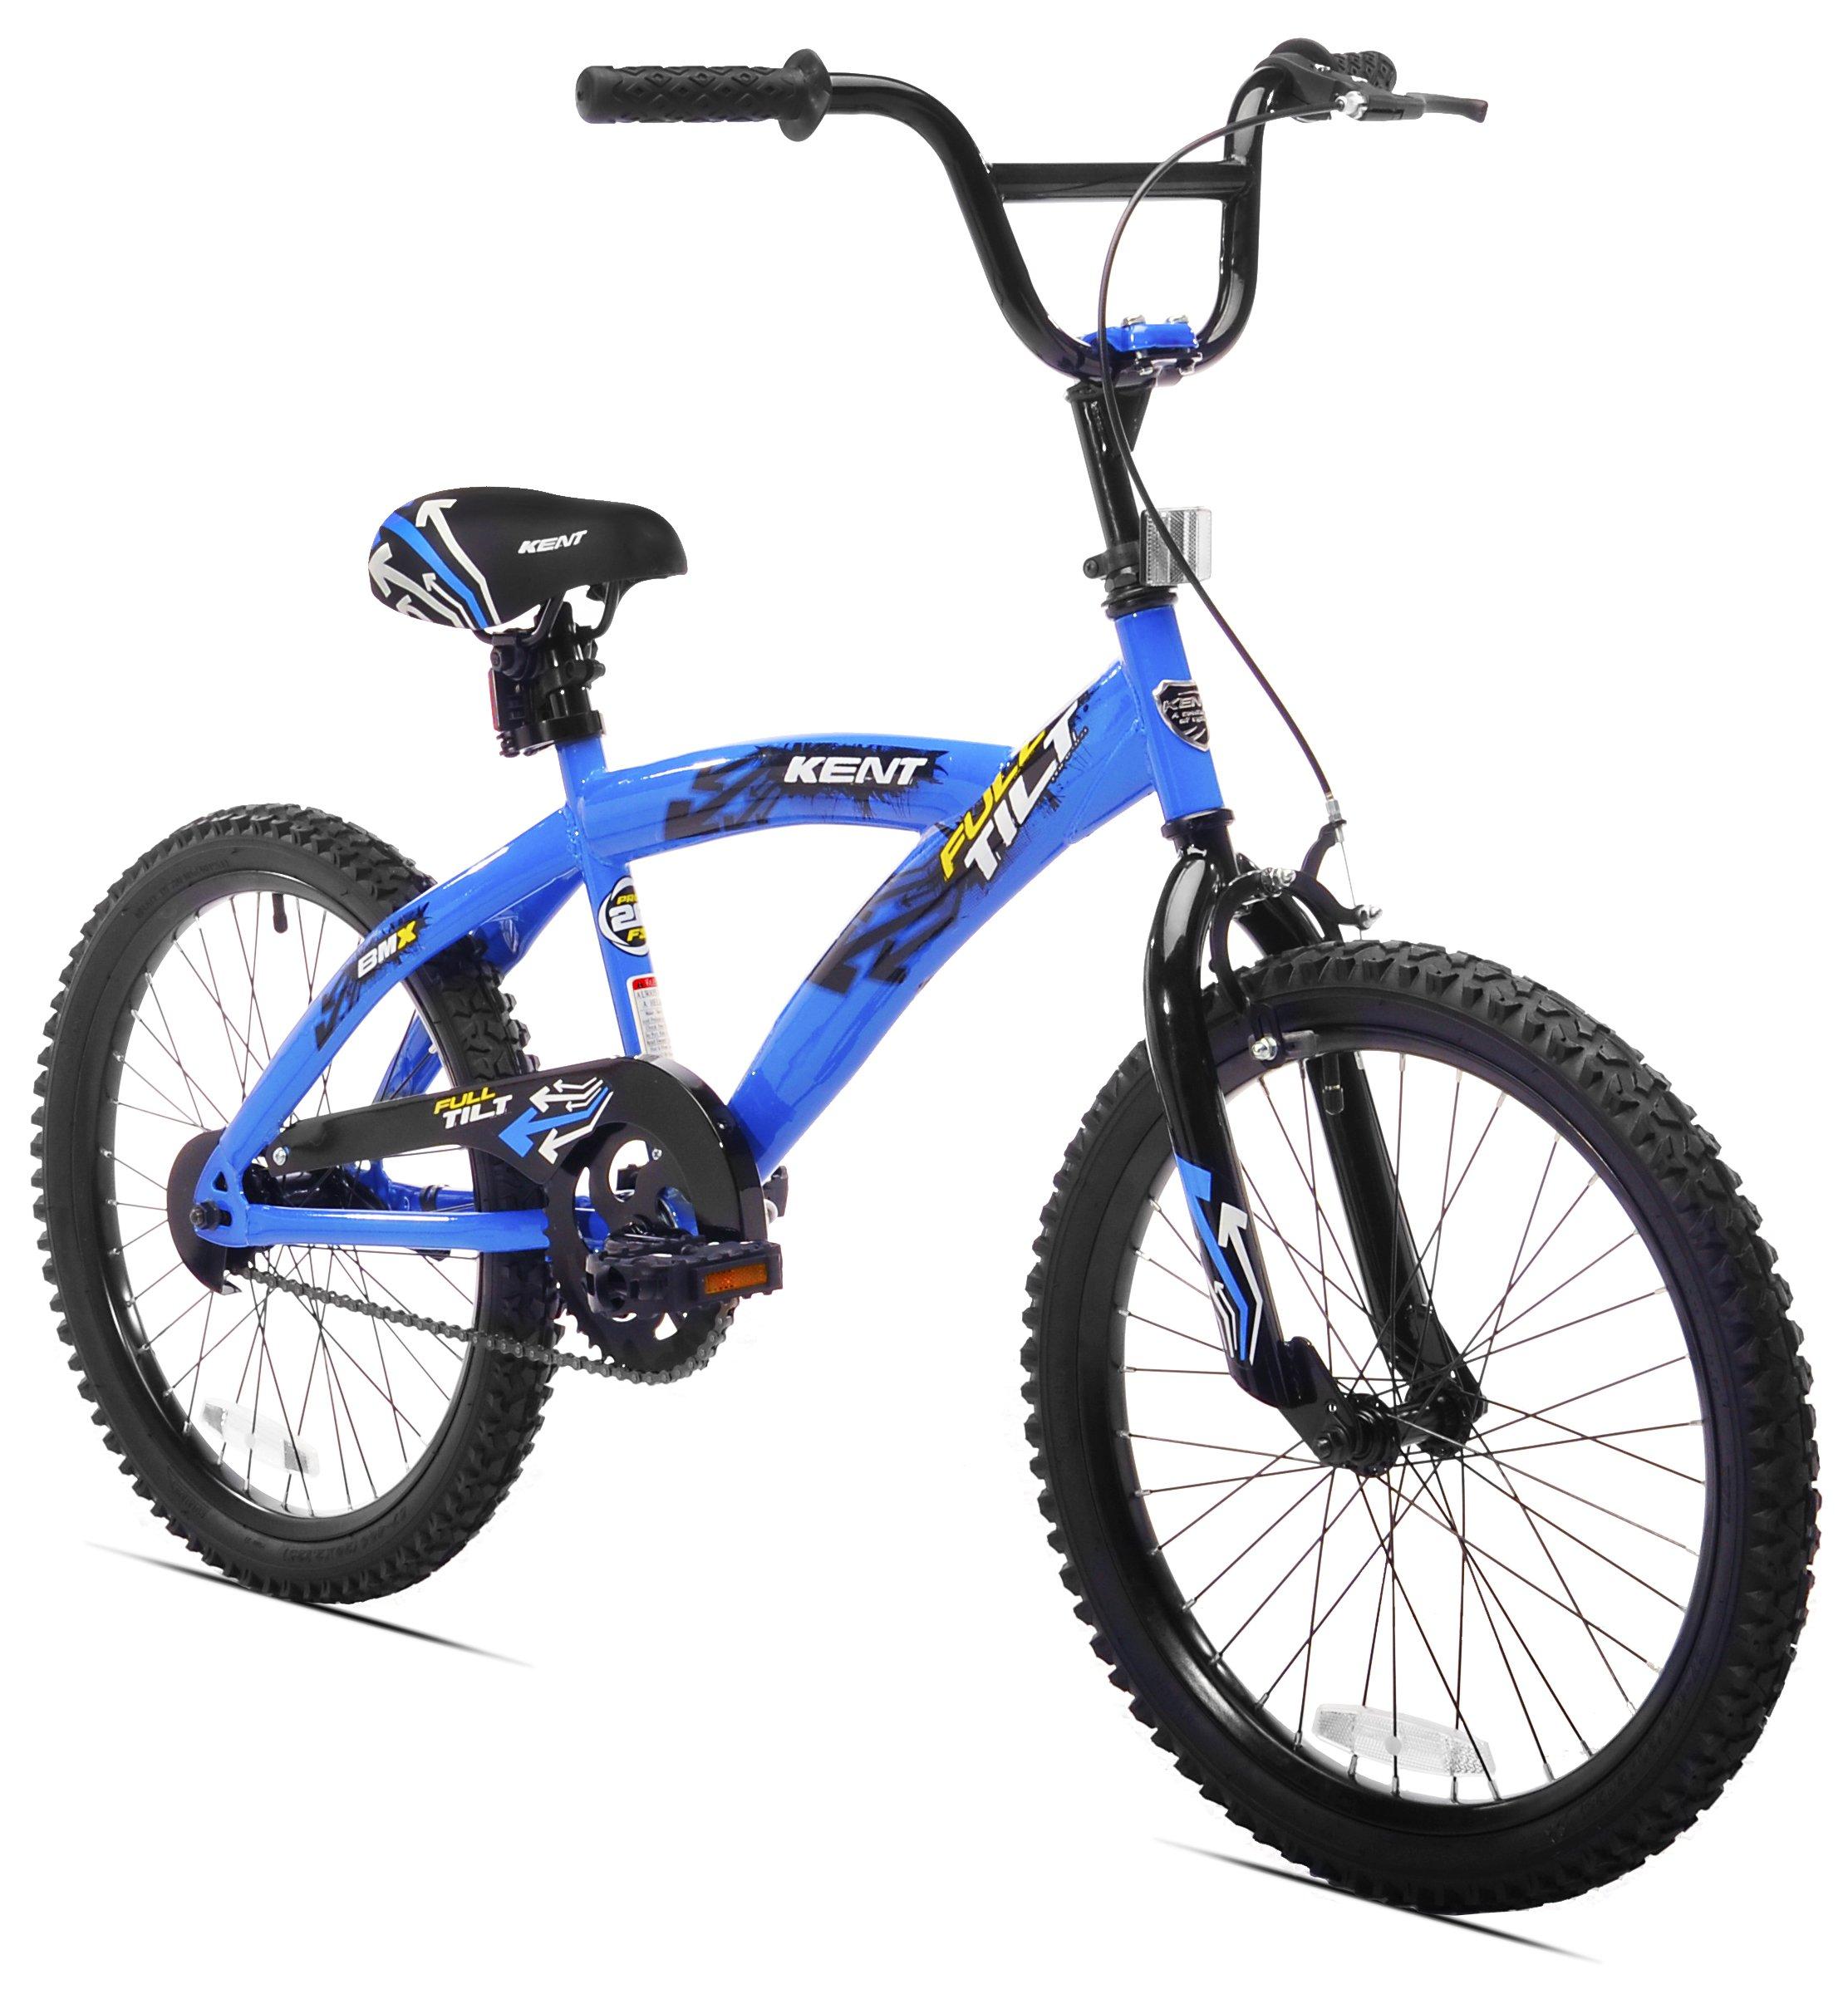 Cheap Kent 16 Inch Bike, find Kent 16 Inch Bike deals on line at ...